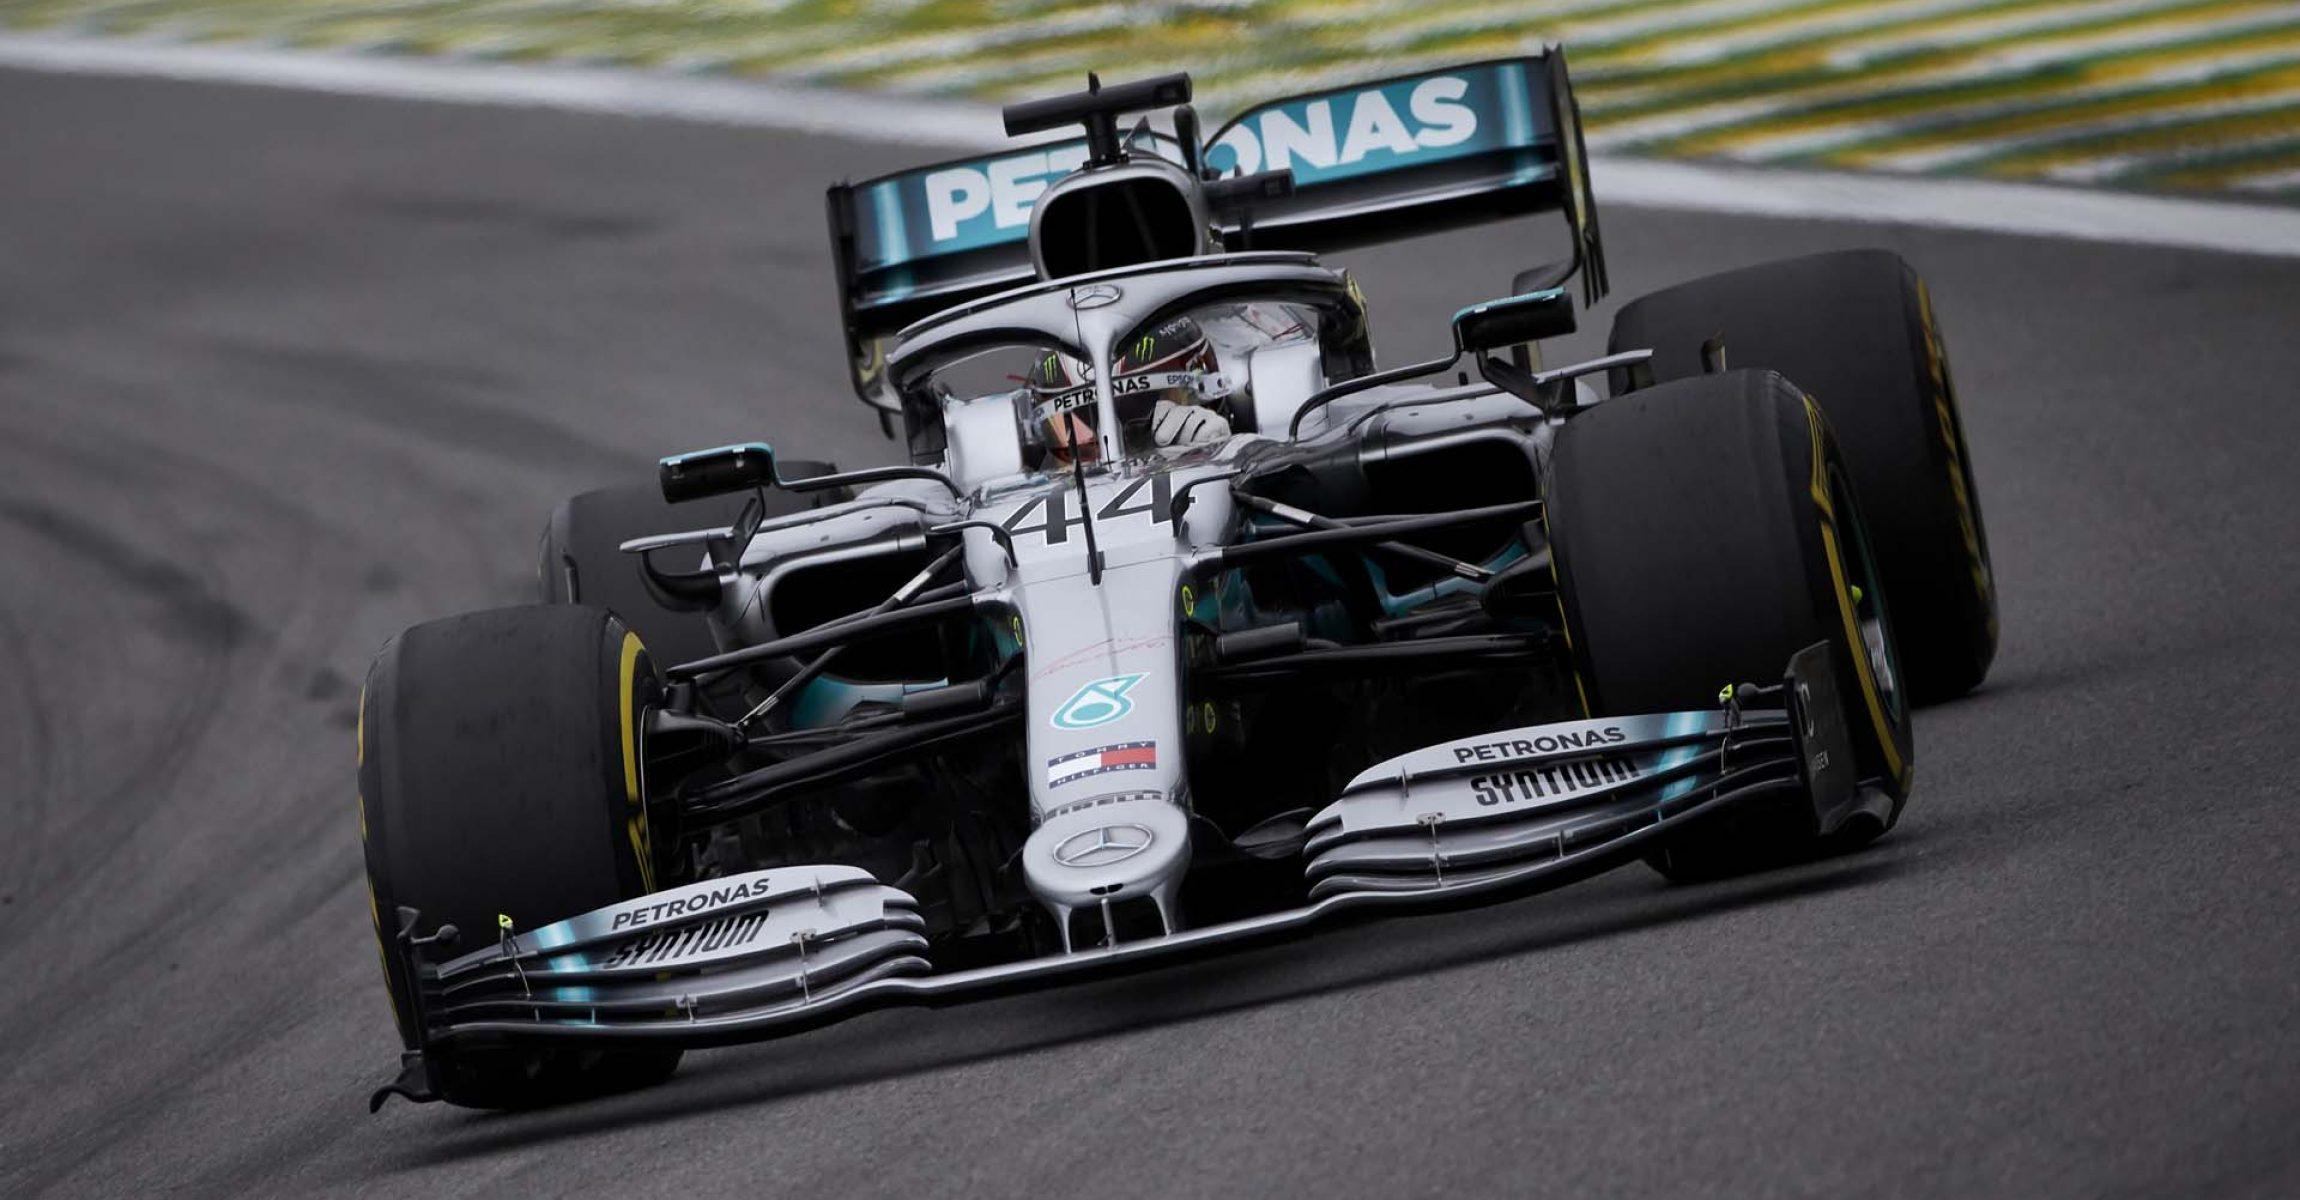 2019 Brazilian Grand Prix, Friday - Steve Etherington Lewis Hamilton Mercedes